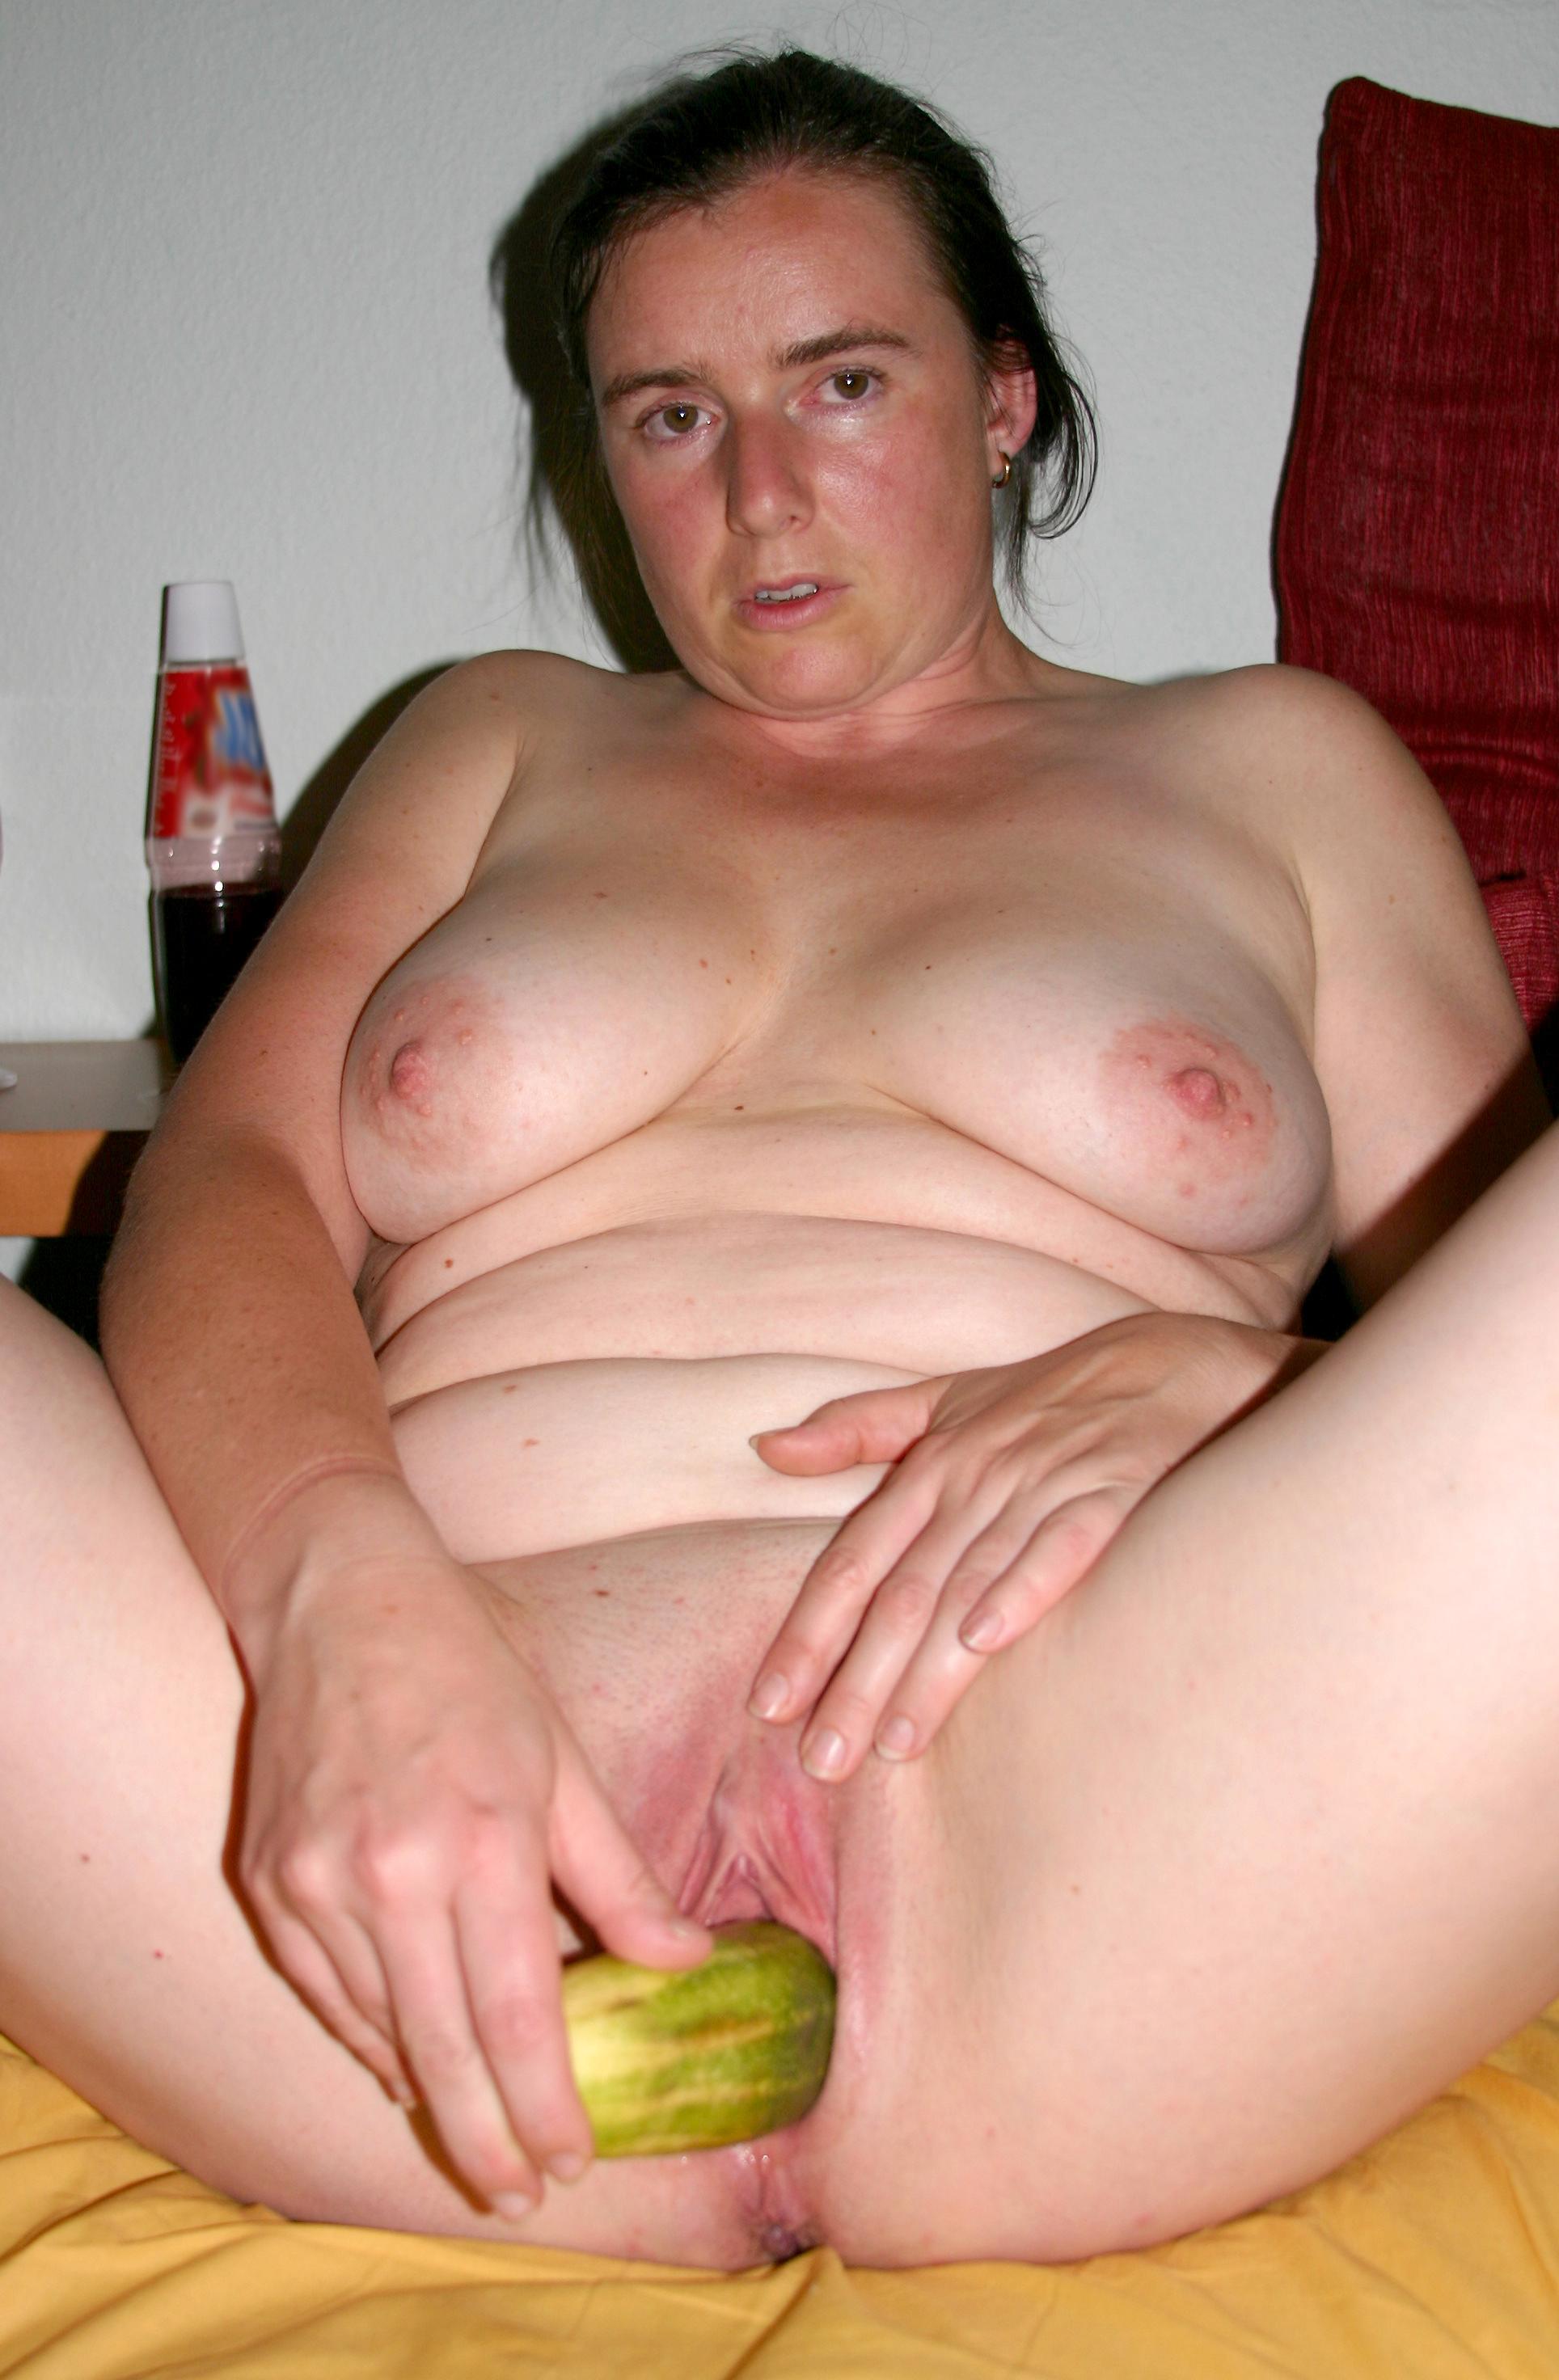 Old pussy masturbating amateur pics